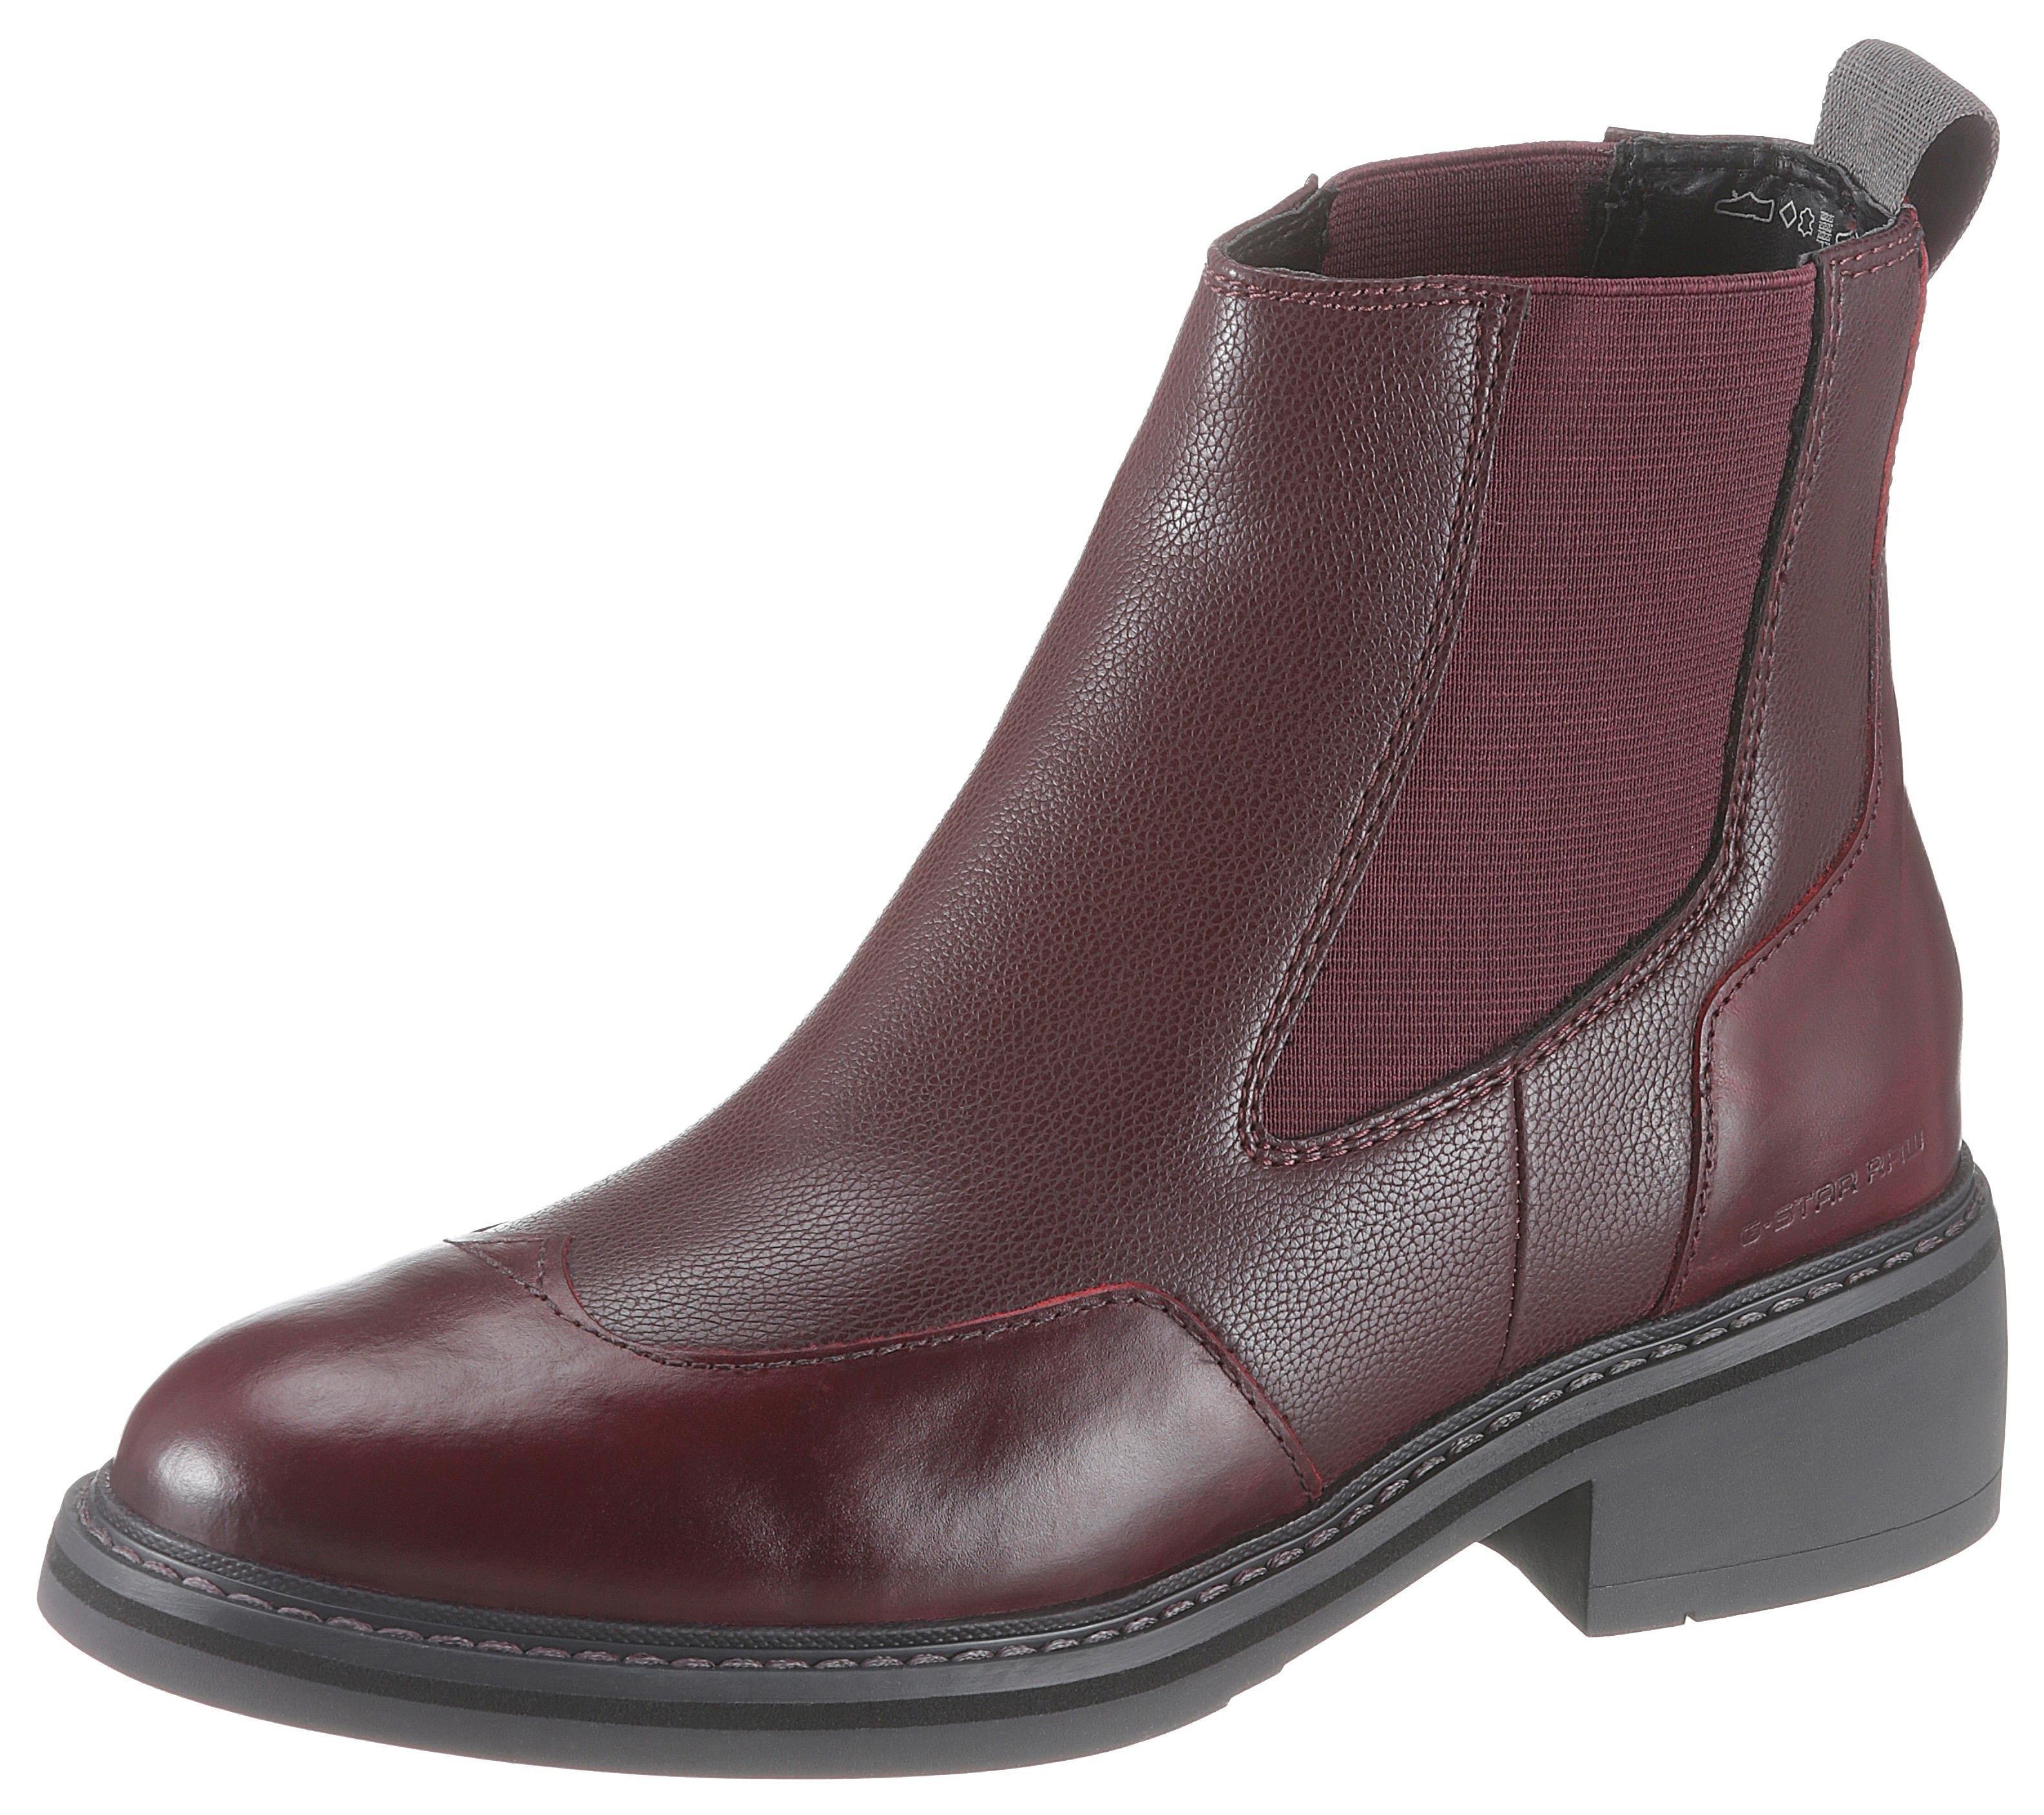 G-star Raw Chelsea-boots »Tacoma Chelsea« nu online kopen bij OTTO